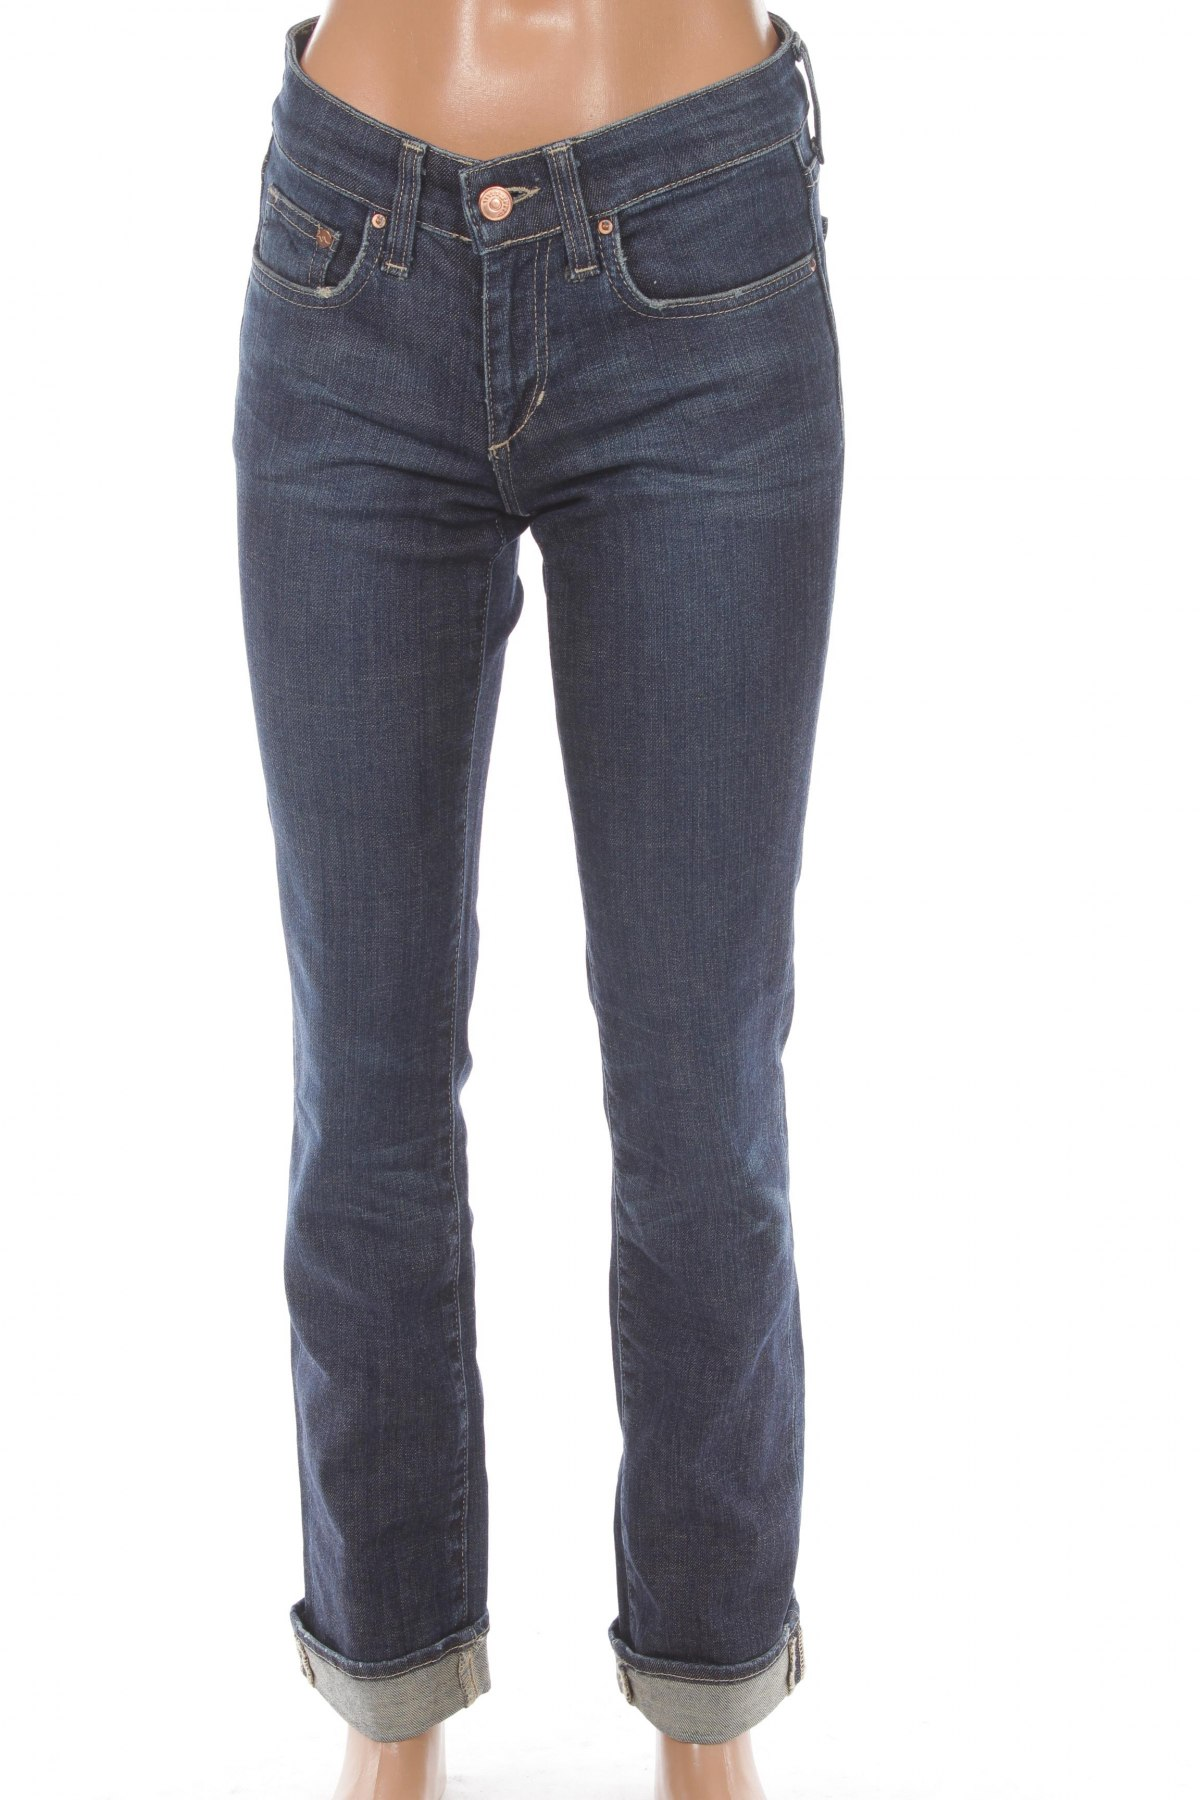 begehrteste Mode UK-Shop offizieller Preis Damen Jeans H&M